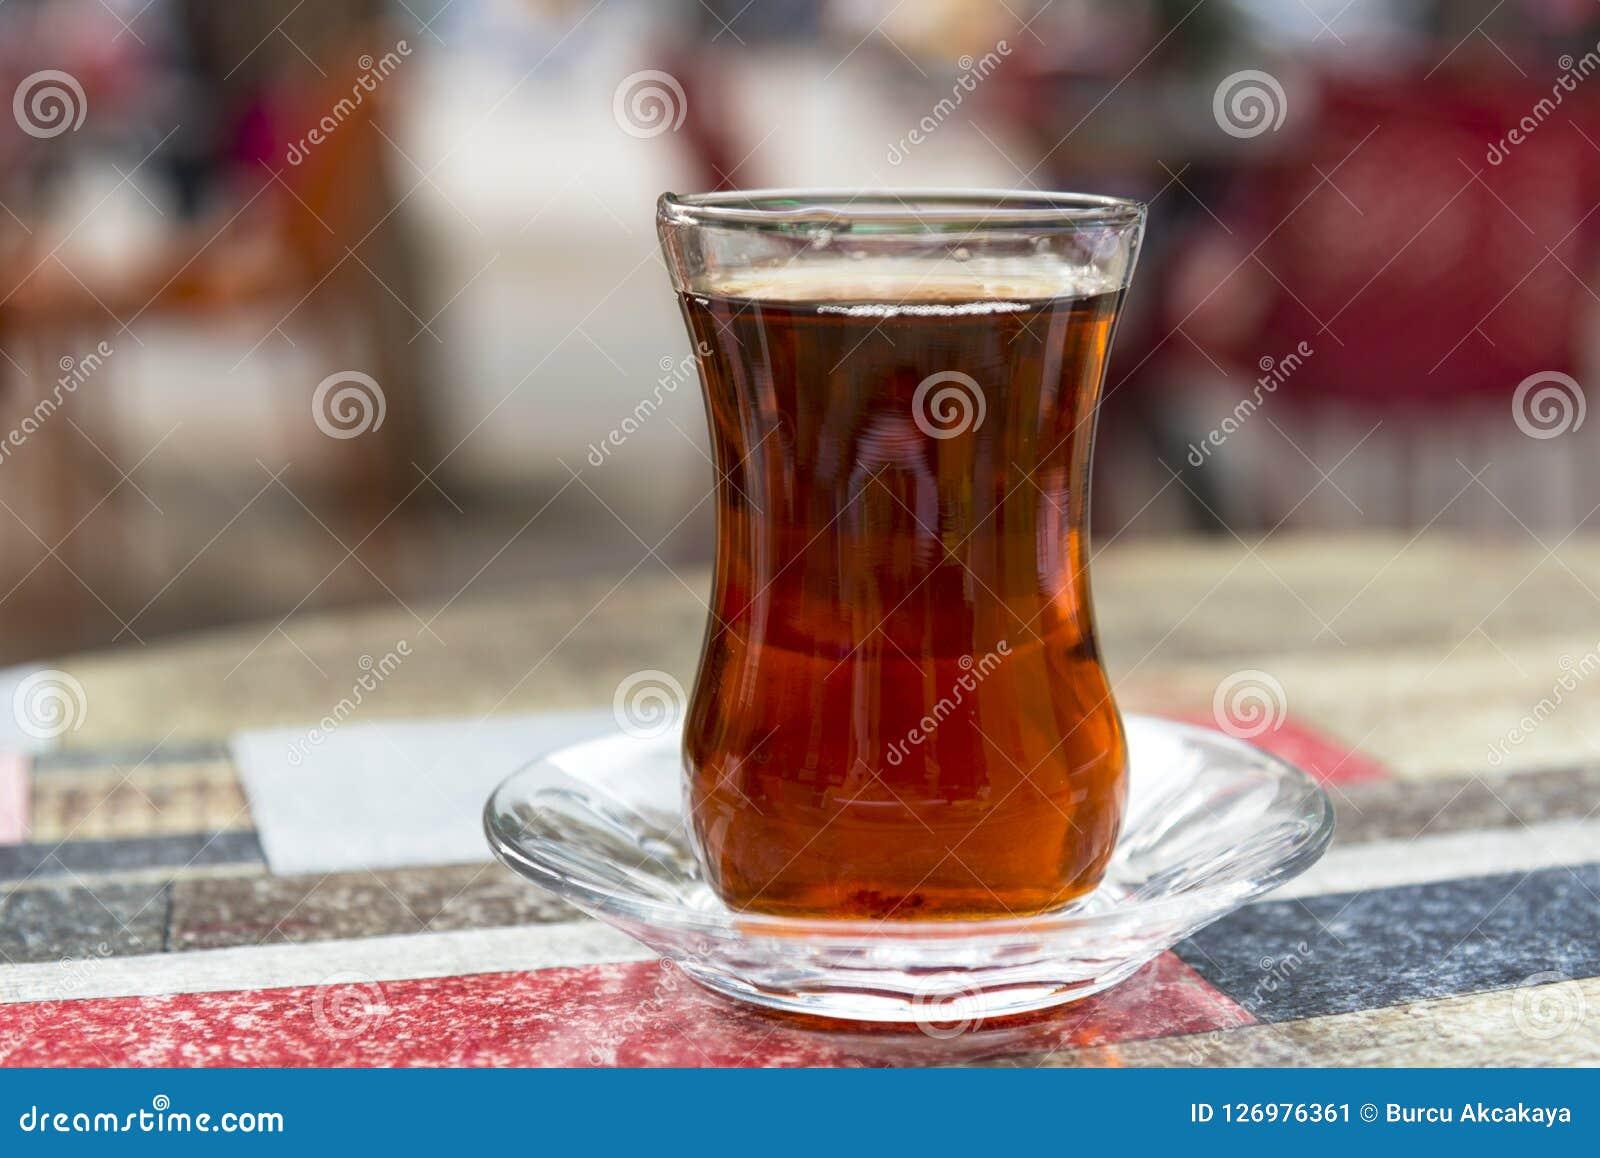 Turecka czarna herbata na cukiernianym stole